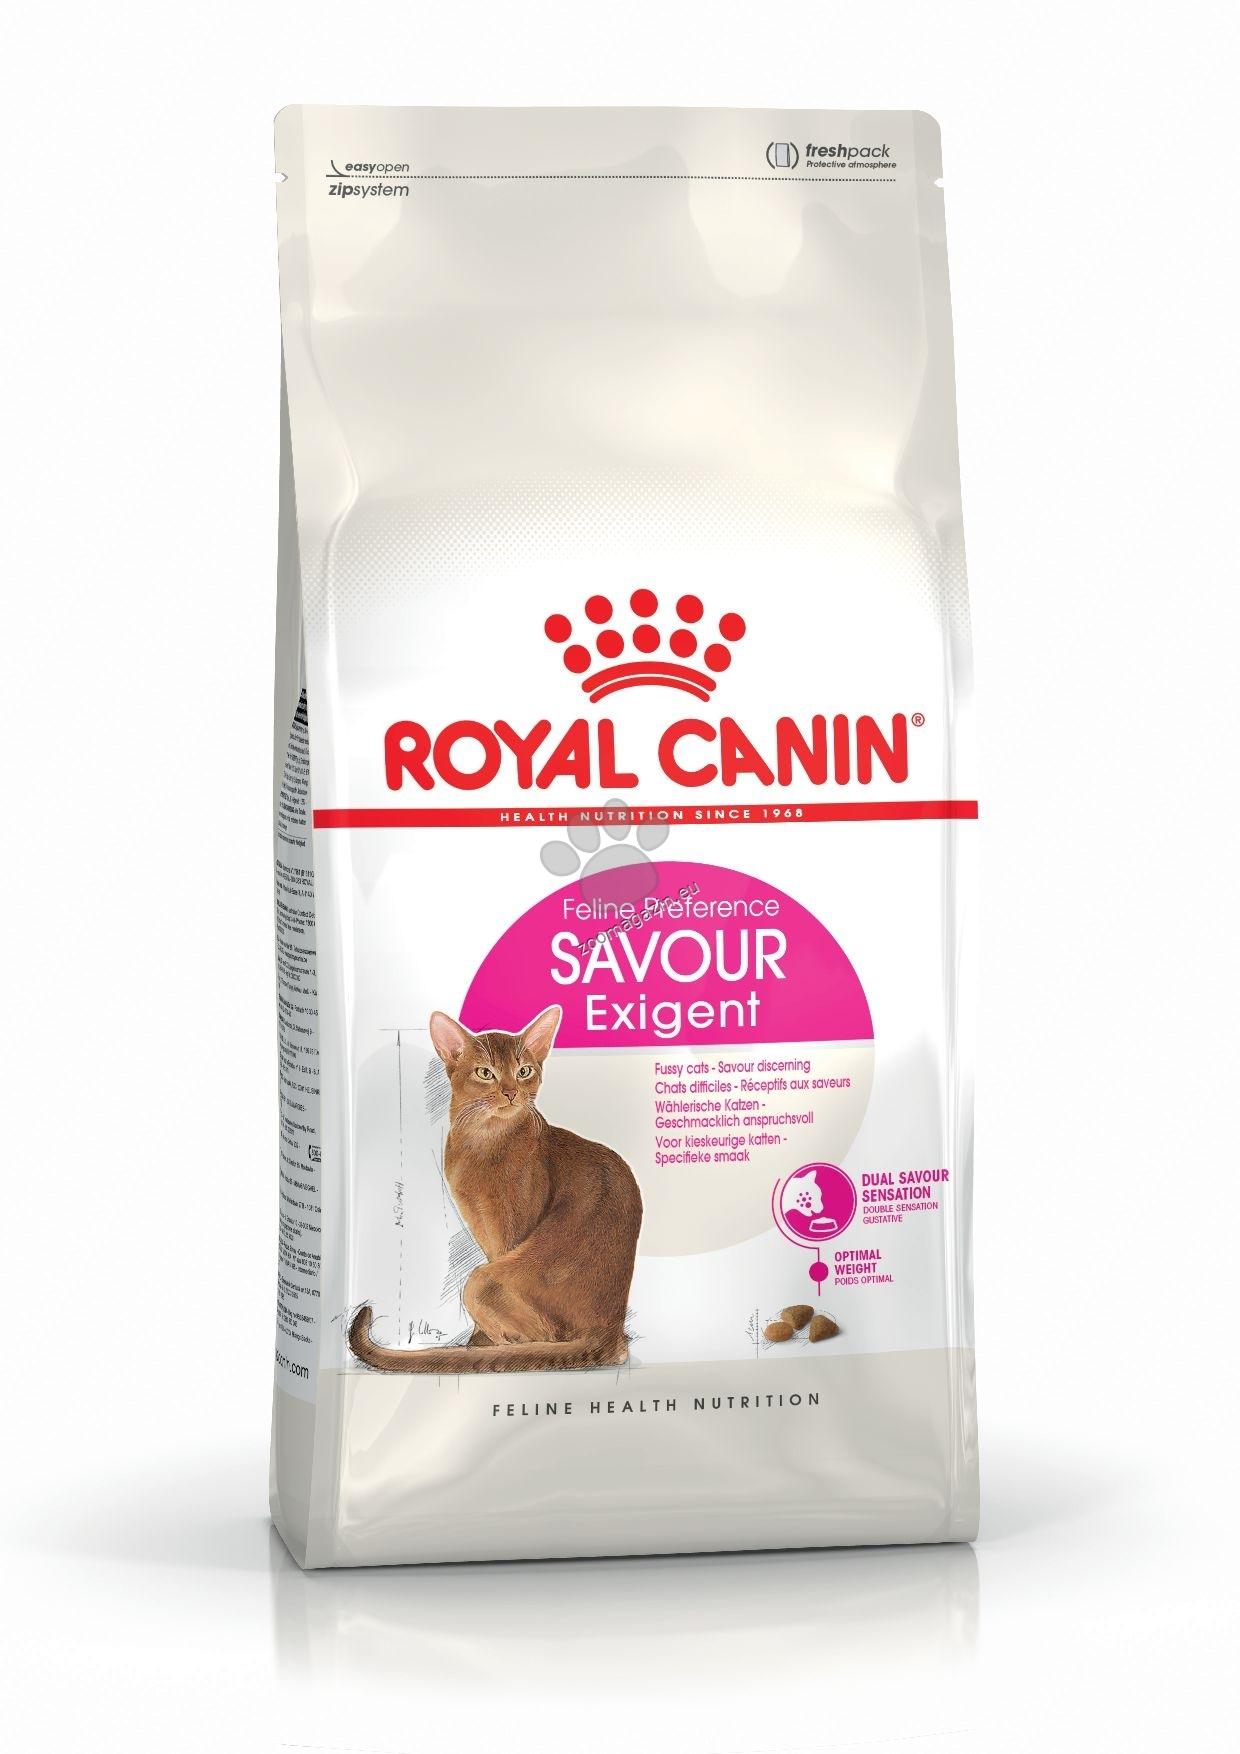 Royal Canin Exigent Savour - за много капризни котки 2 кг.